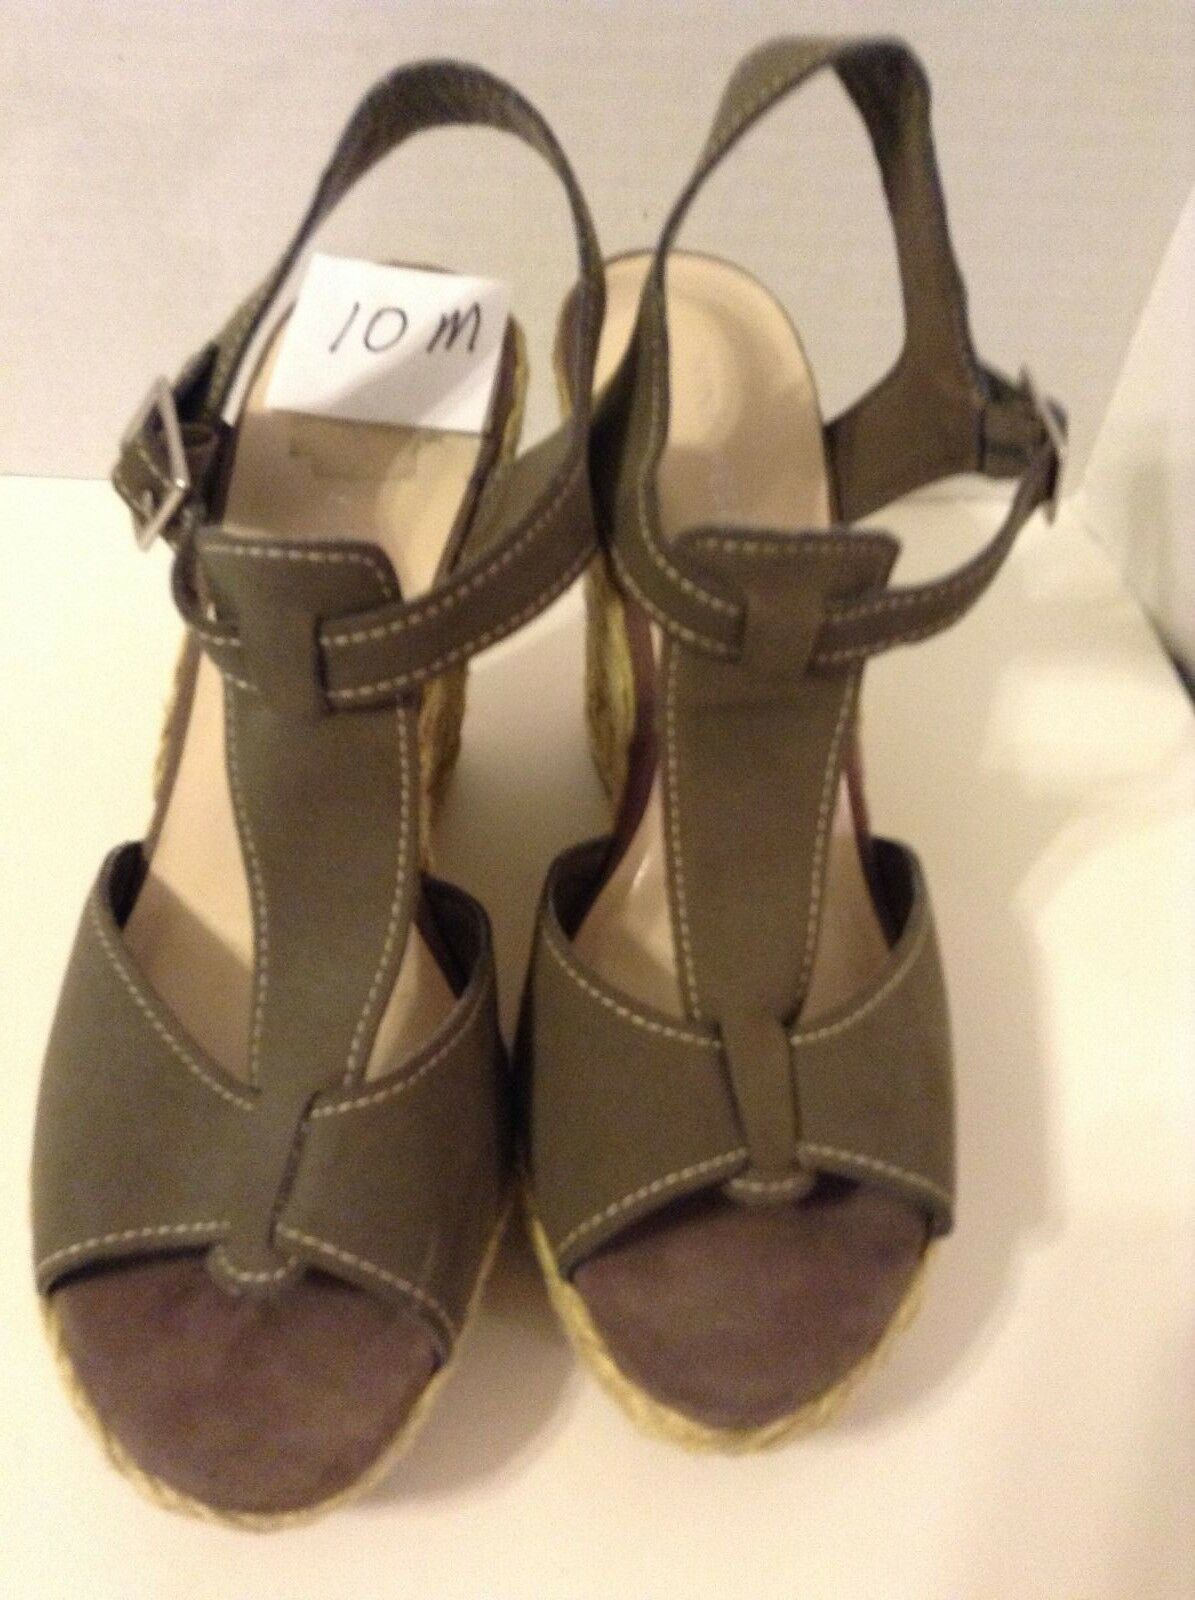 Nine West Women's Wedge 10 Medium Olive B Olive Medium Green Solid Suede High (3 in) Shoe 166c87